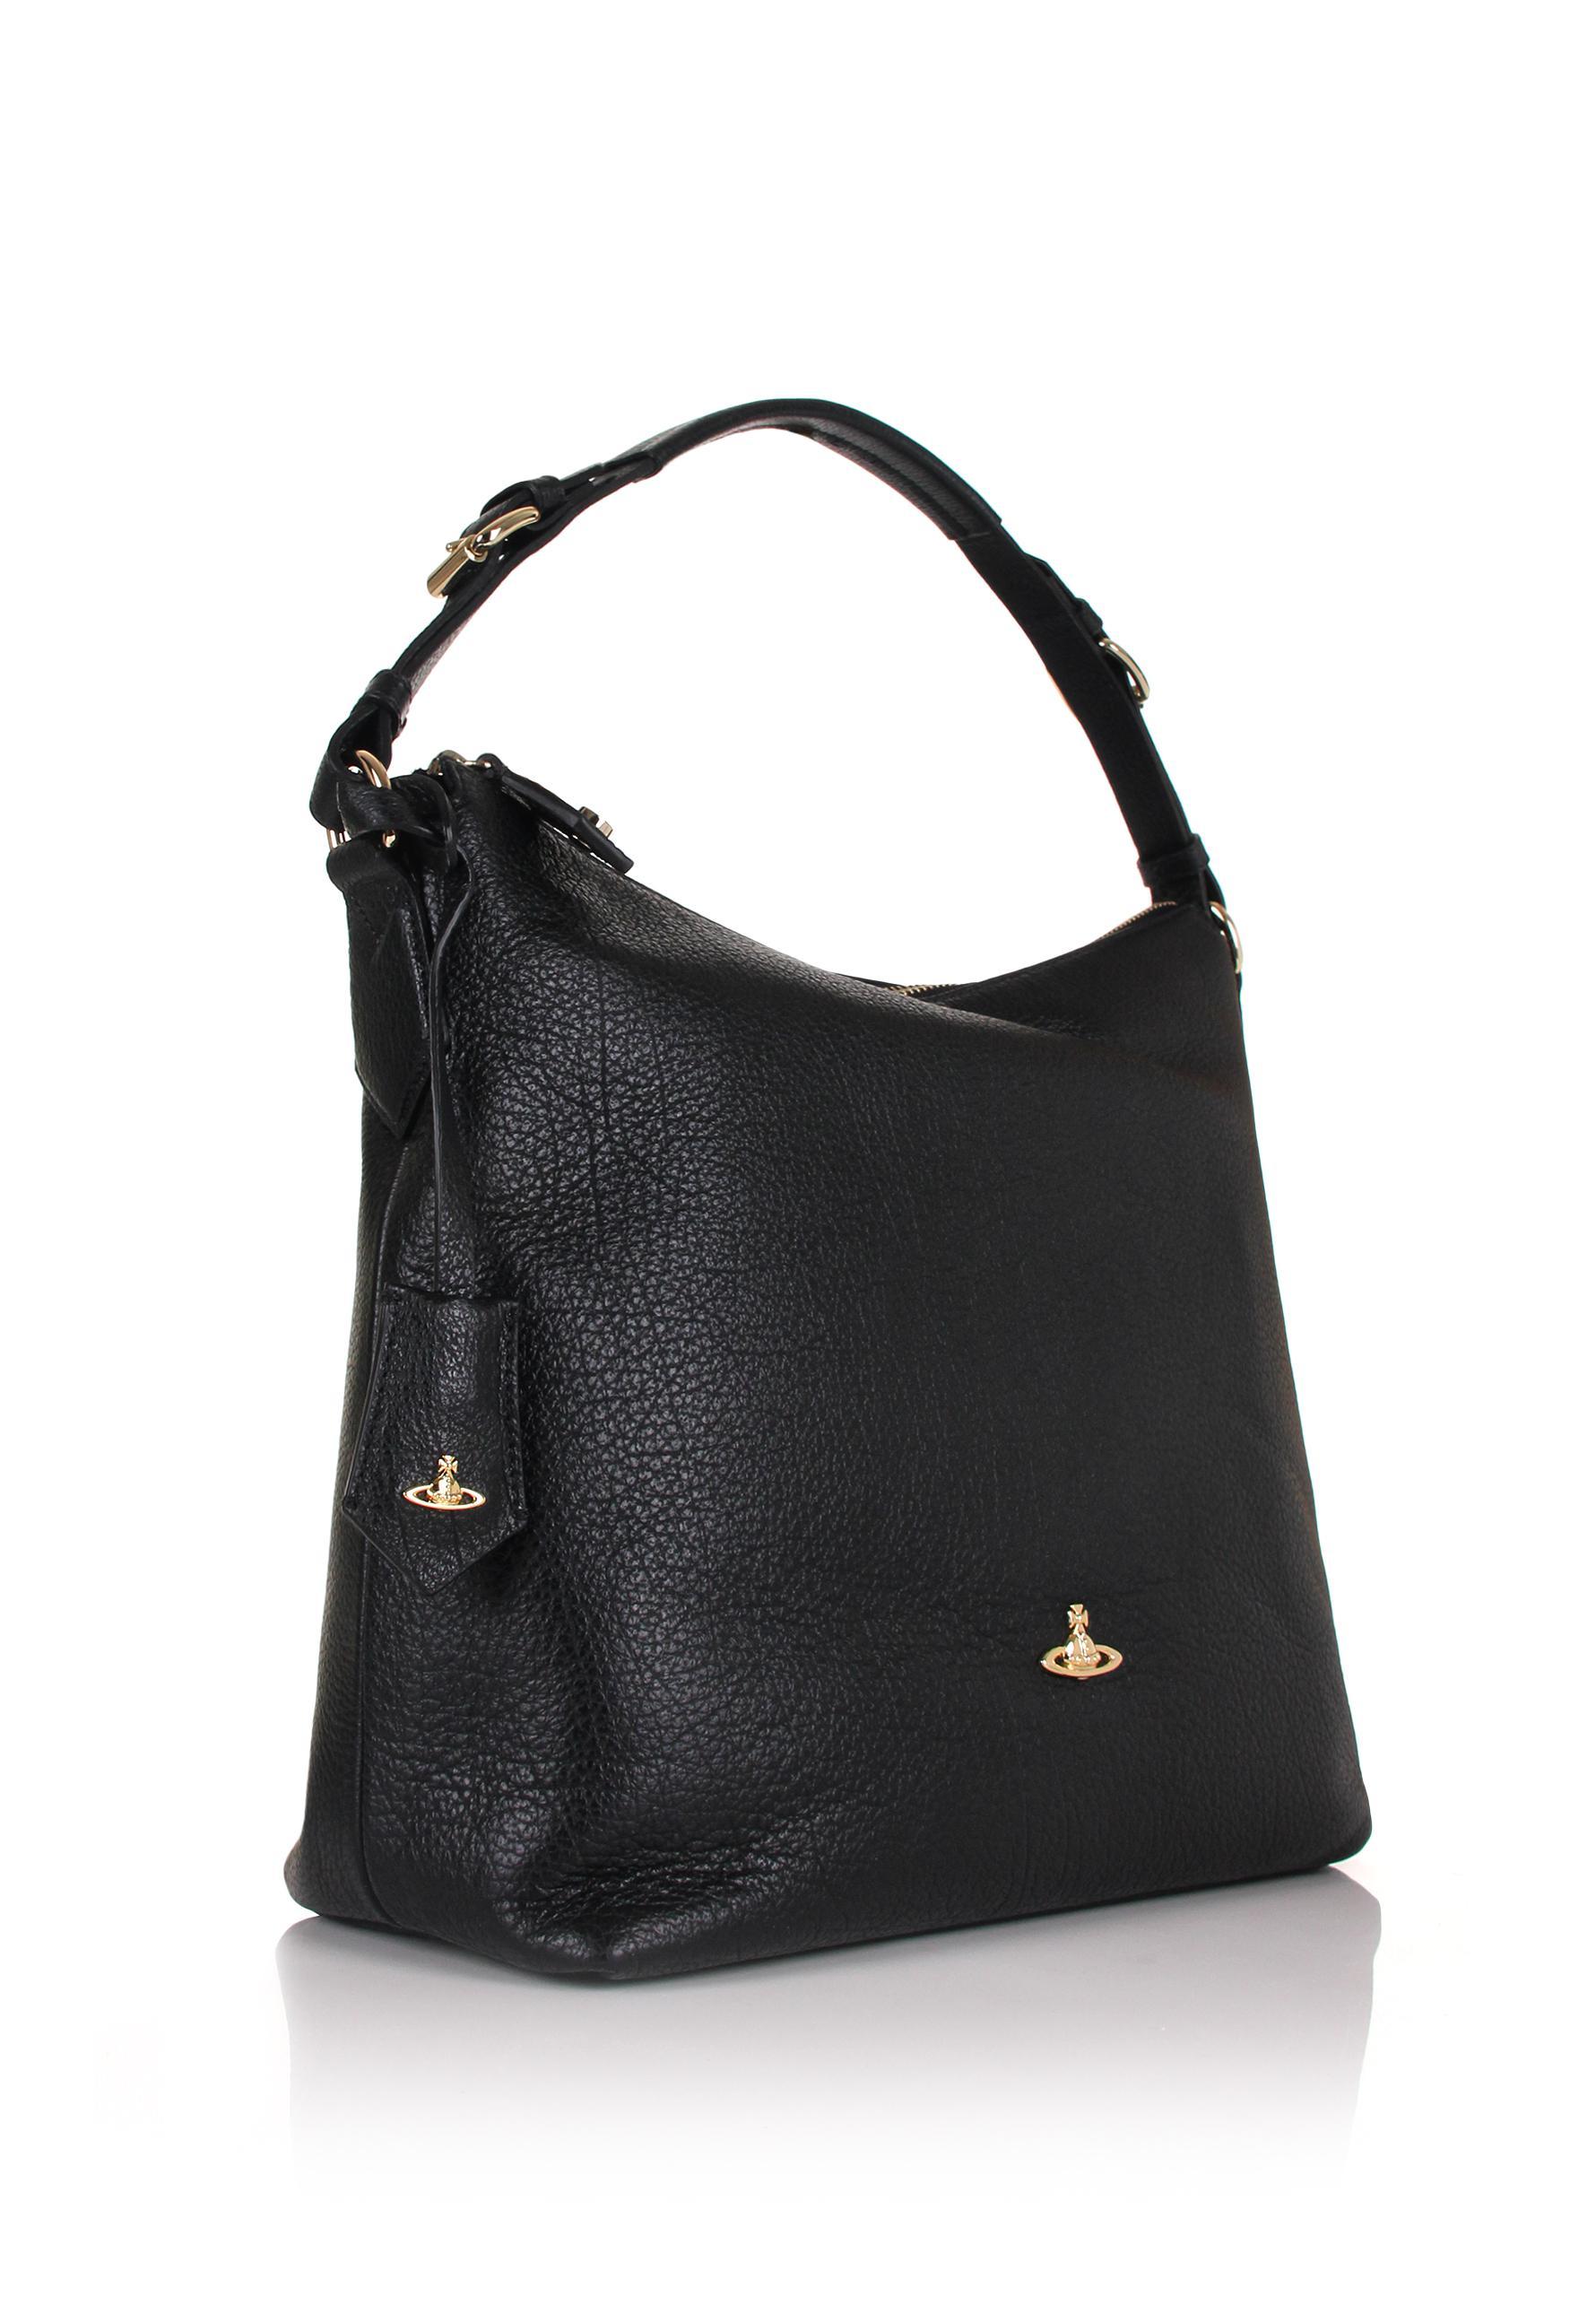 0d512c4ad683 Lyst - Vivienne Westwood Balmoral 131117 Hobo Bag Black in Black